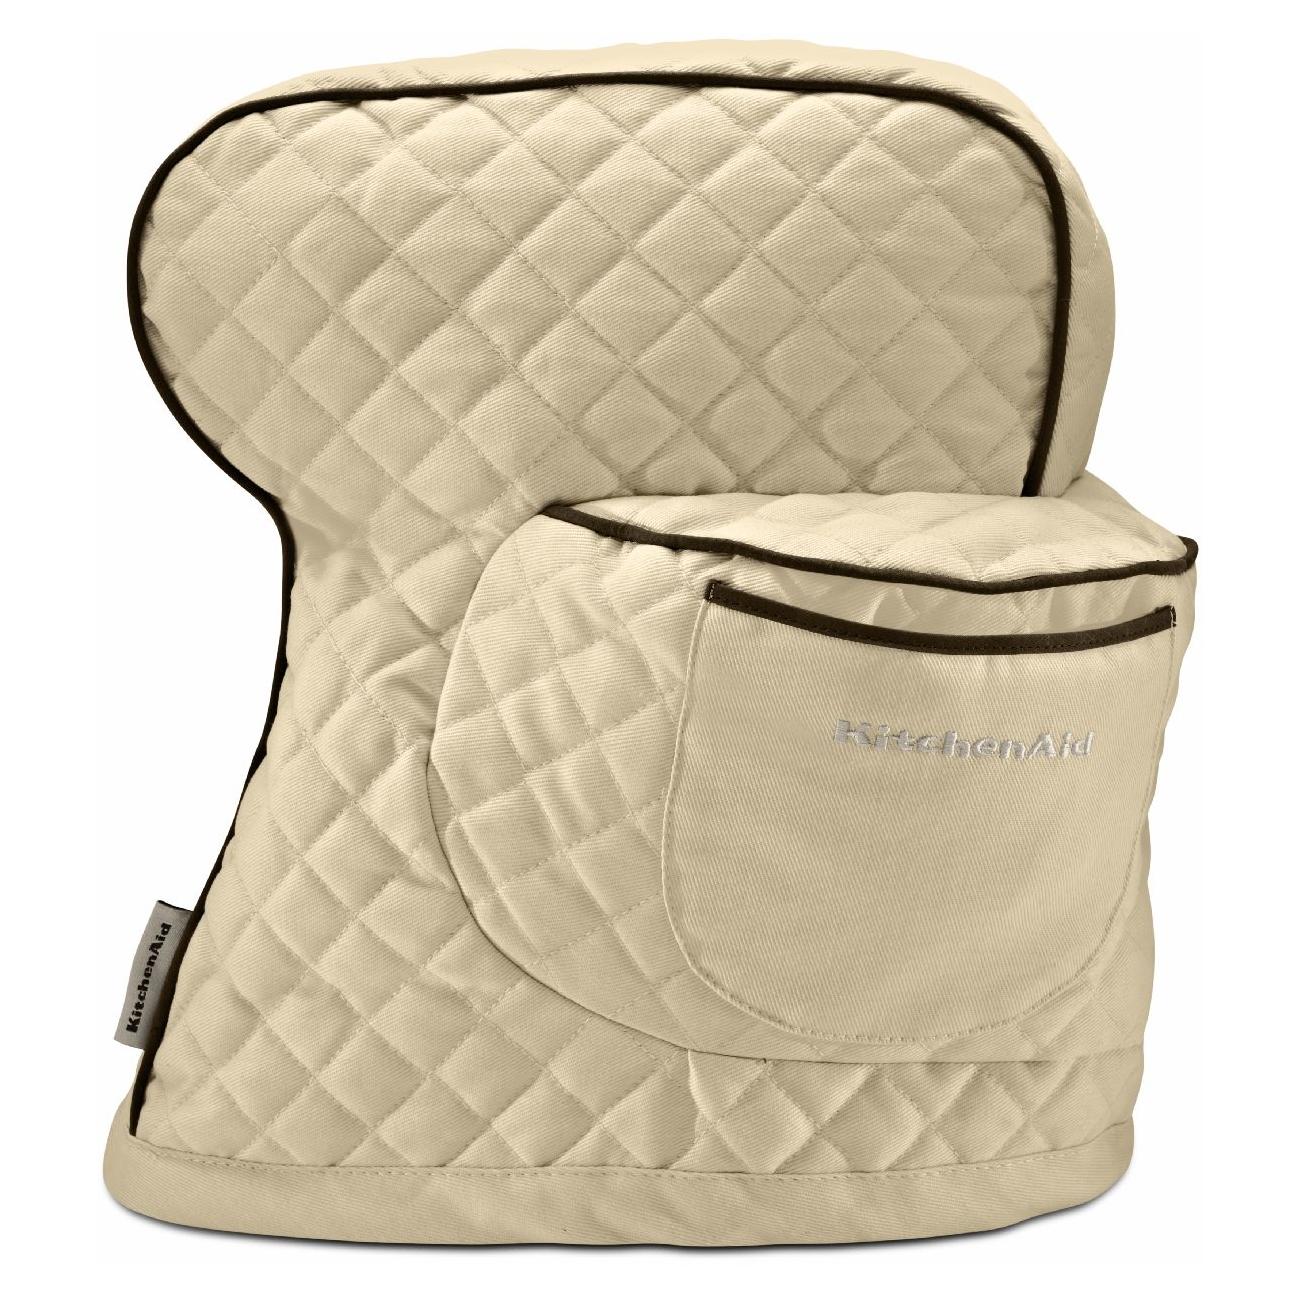 KitchenAid Khaki 100% Cotton Fitted Stand Mixer Cover